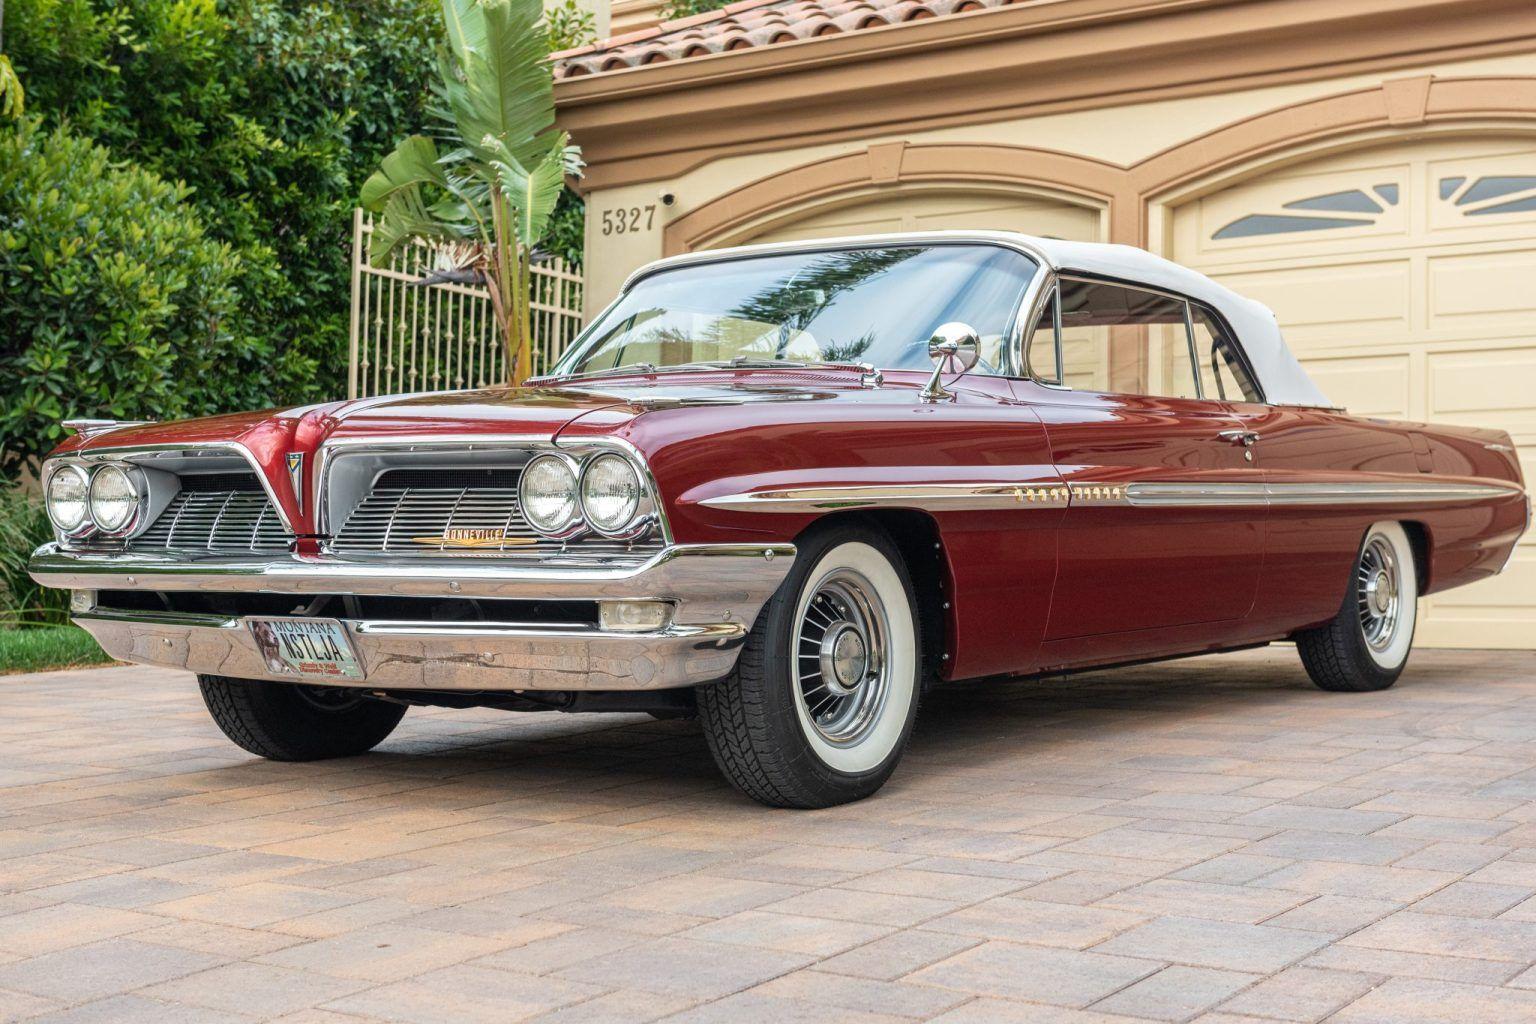 1961 Pontiac Bonneville Convertible 389 4 Speed In 2020 Pontiac Bonneville Pontiac Bonneville